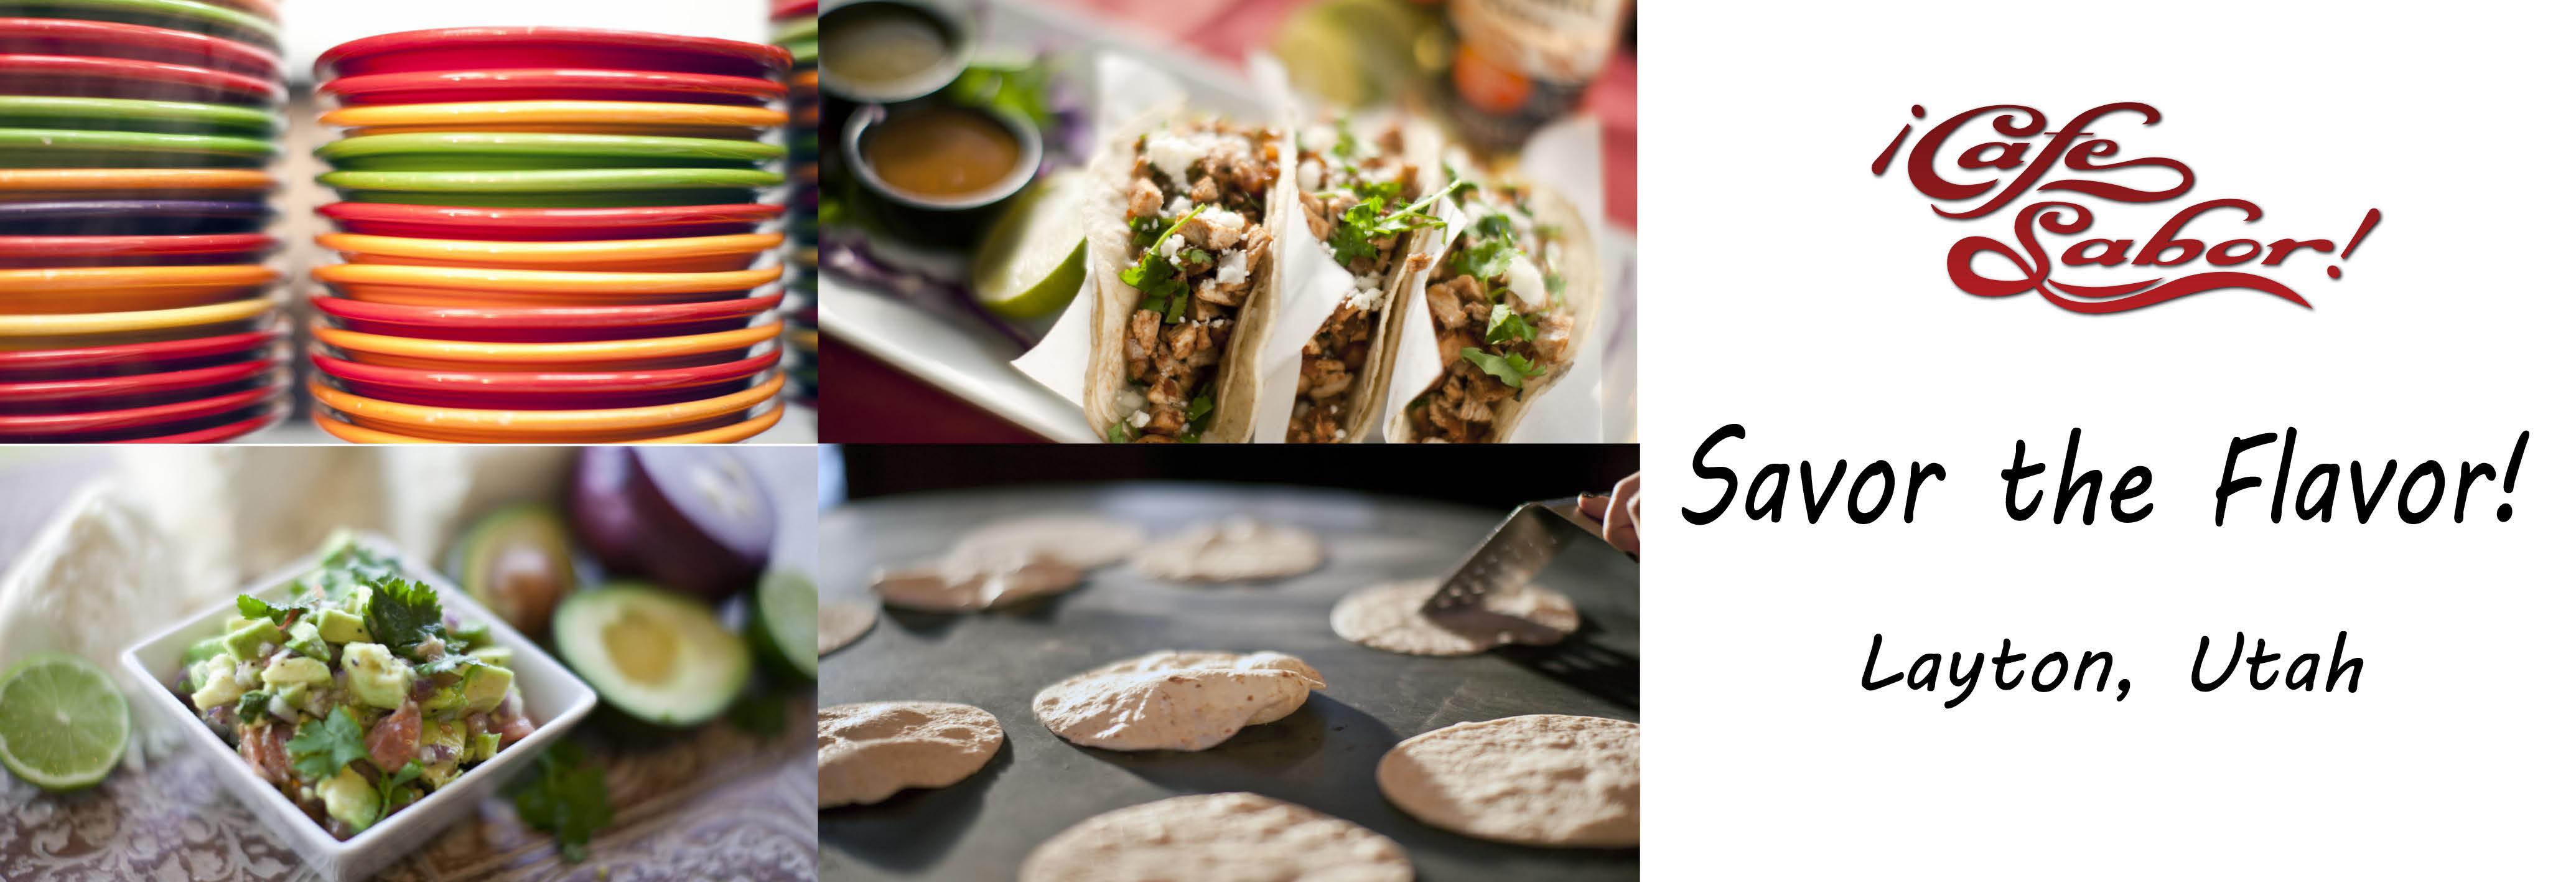 Cafe Sabor Mexican Restaurant banner